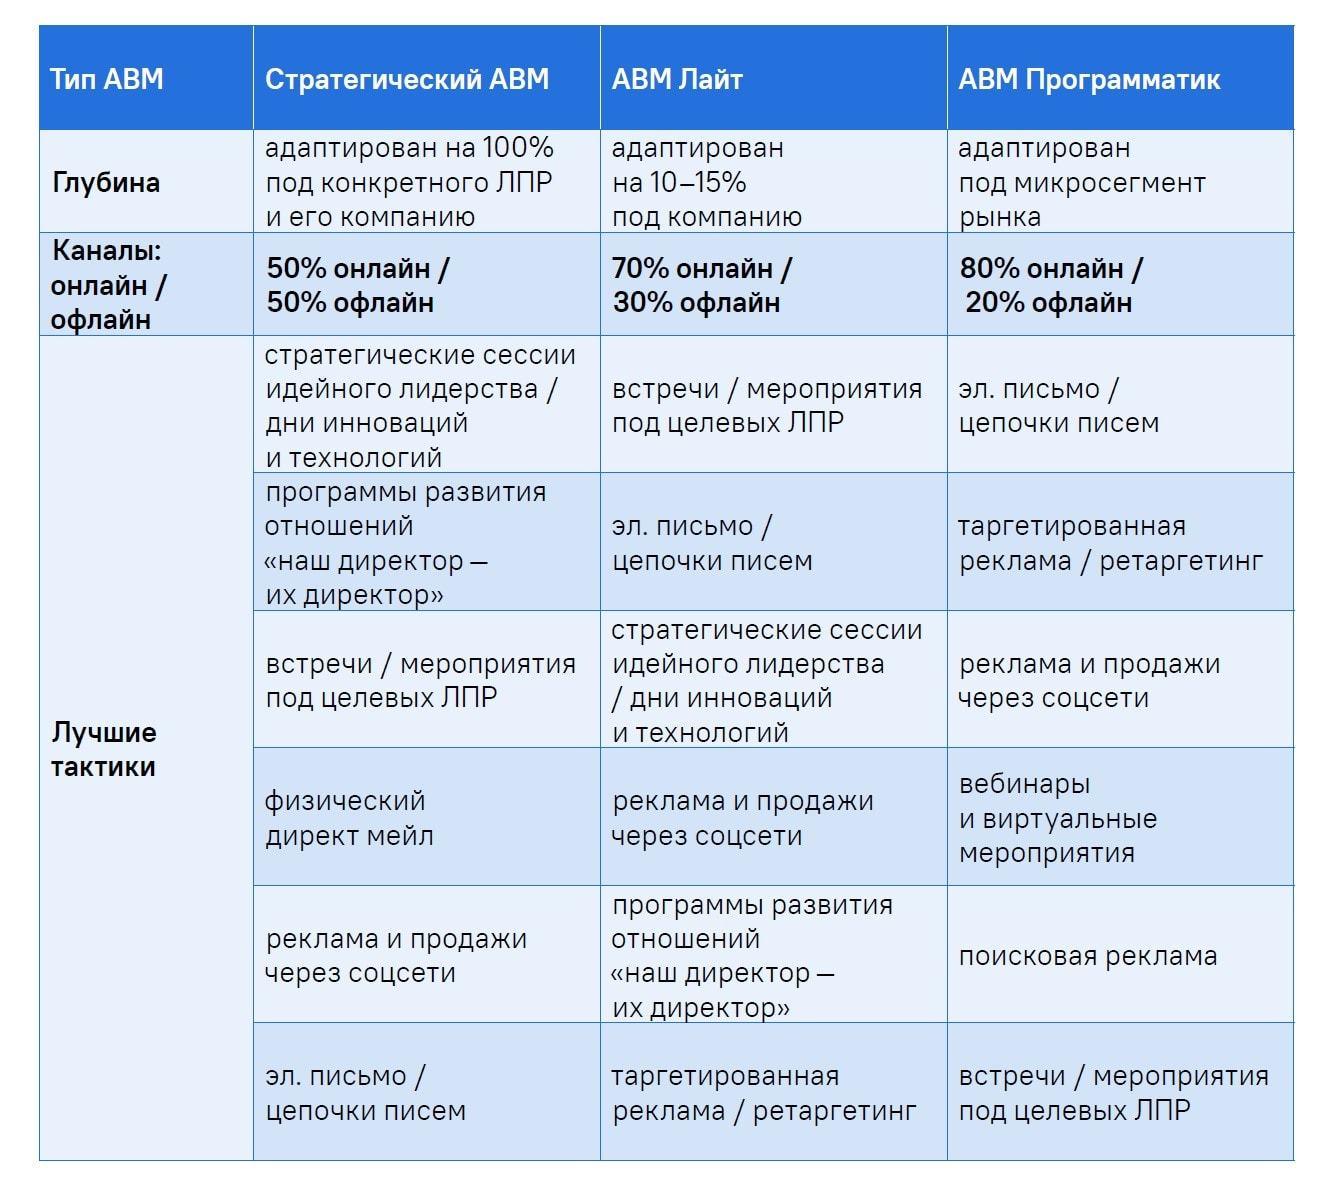 Лучшие тактики для каждого типа ABM-программ